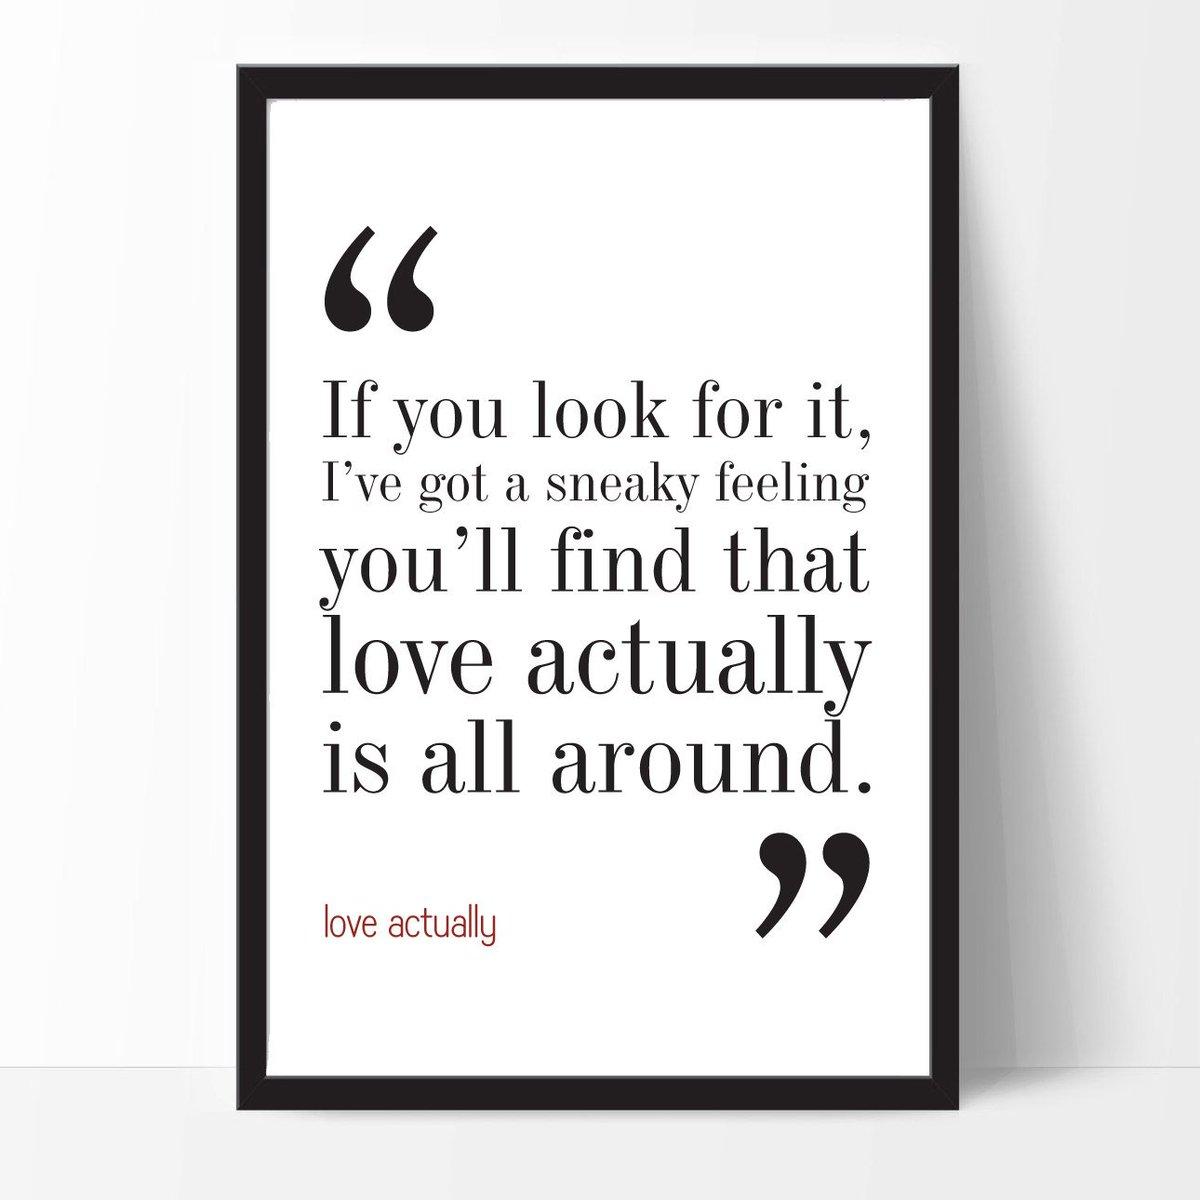 Love Actually Movie Quote. Typography Print. 8x10 on A4 Archival Matt…  http:// tuppu.net/3faa7841  &nbsp;   #WallDecor #LoveQuote <br>http://pic.twitter.com/zubzcENjPj